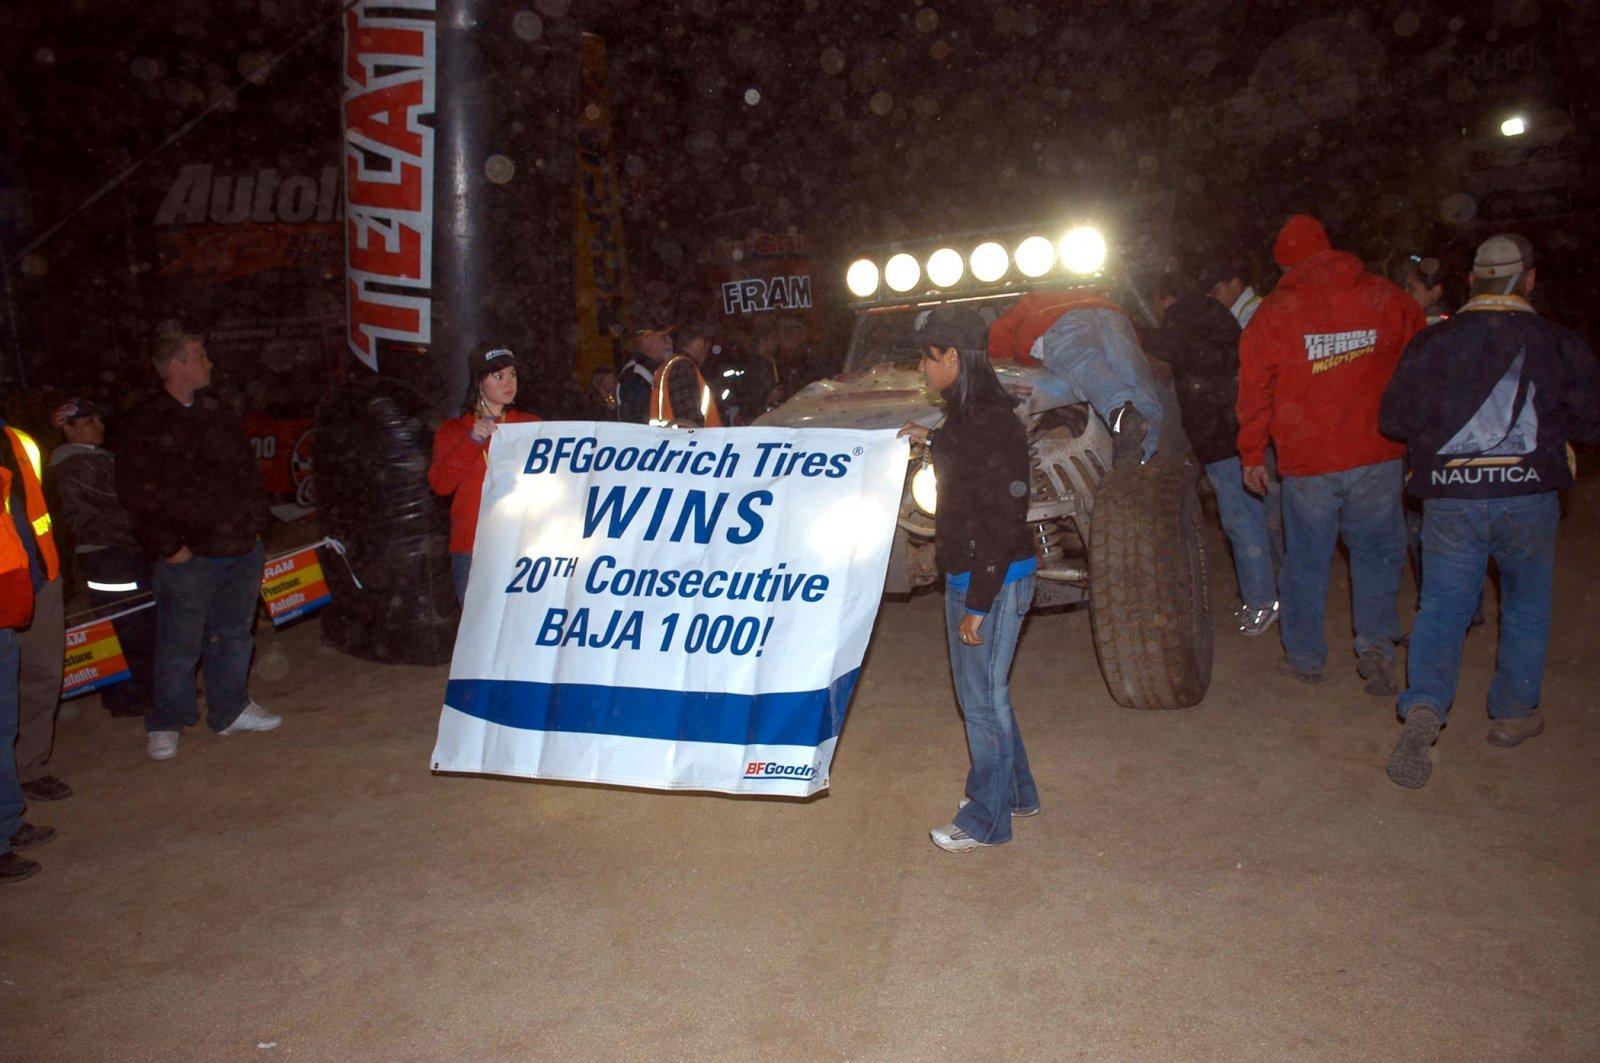 2005.Baja 1000.Herbst.BFG 20th Win.01.21x.jpg